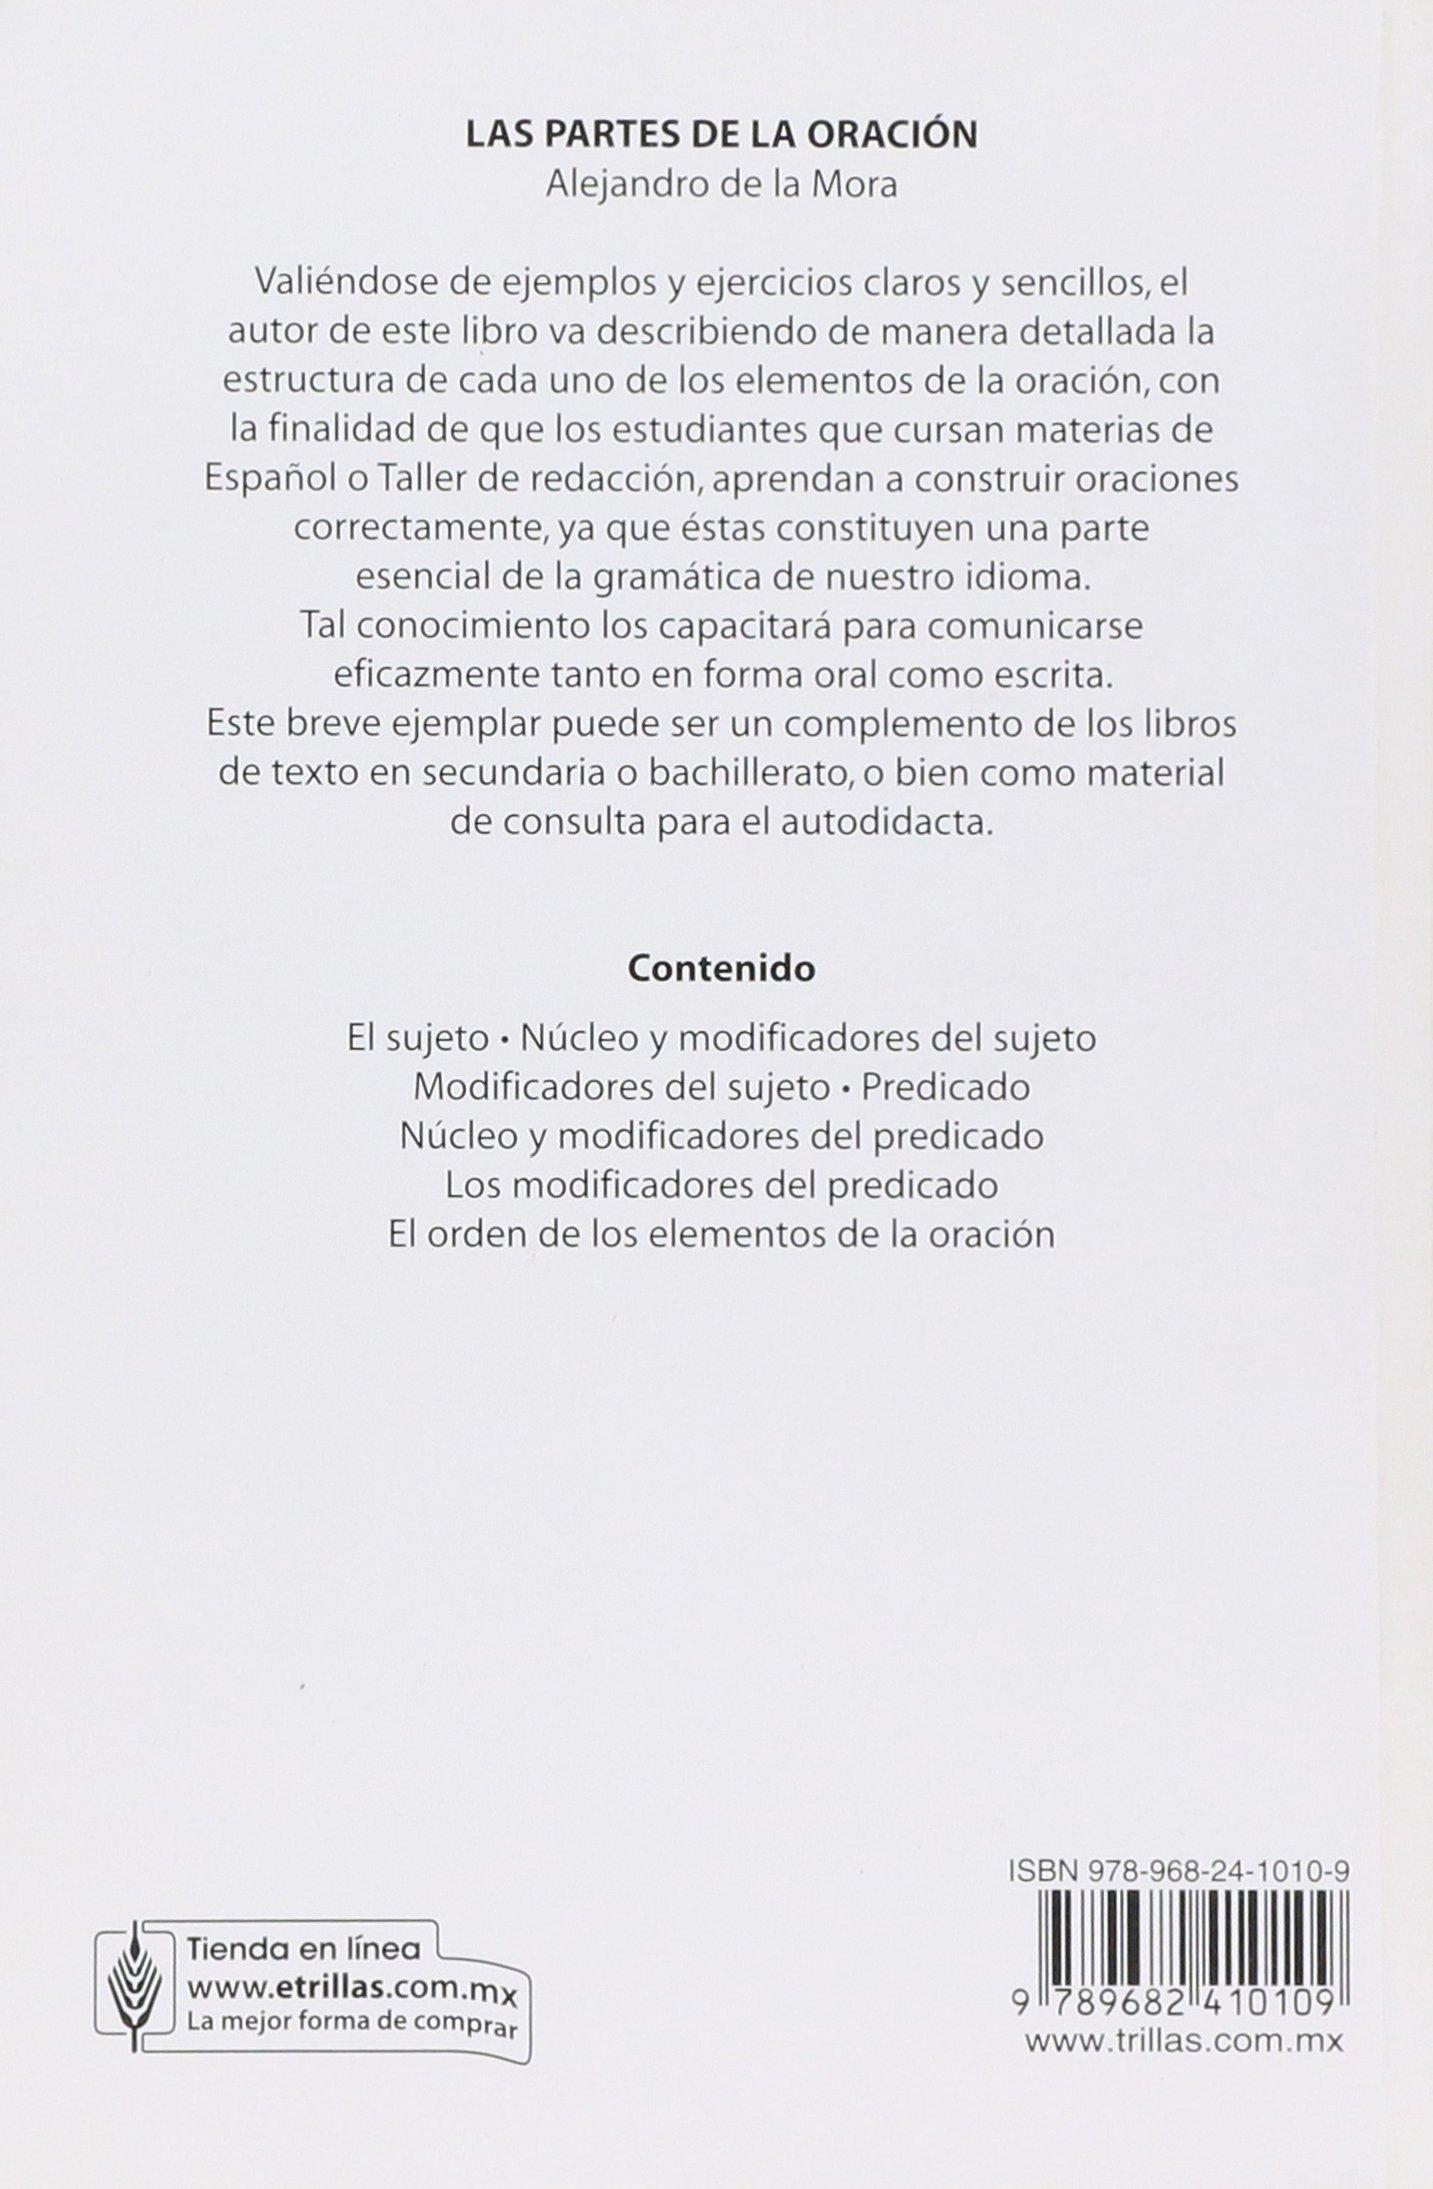 Las Partes De La Oracion: ALEJANDRO DE LA MORA: 9789682410109: Amazon.com: Books